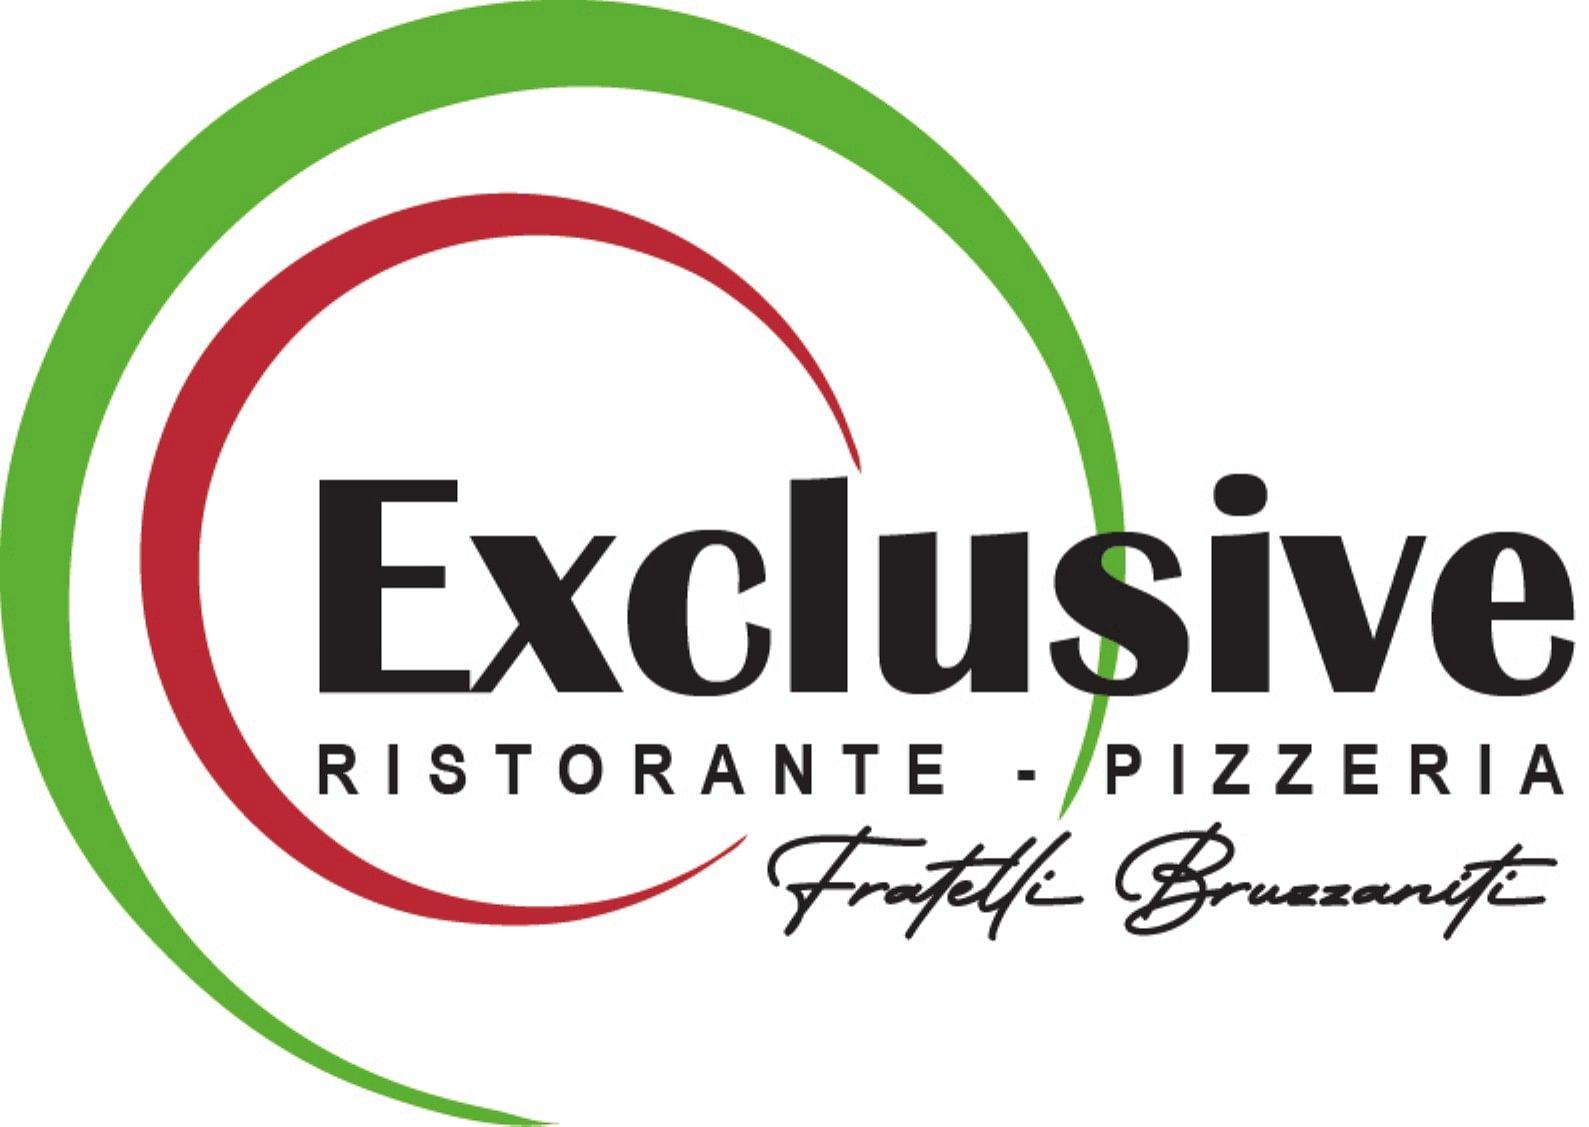 Exclusive Ristorante Pizzeria